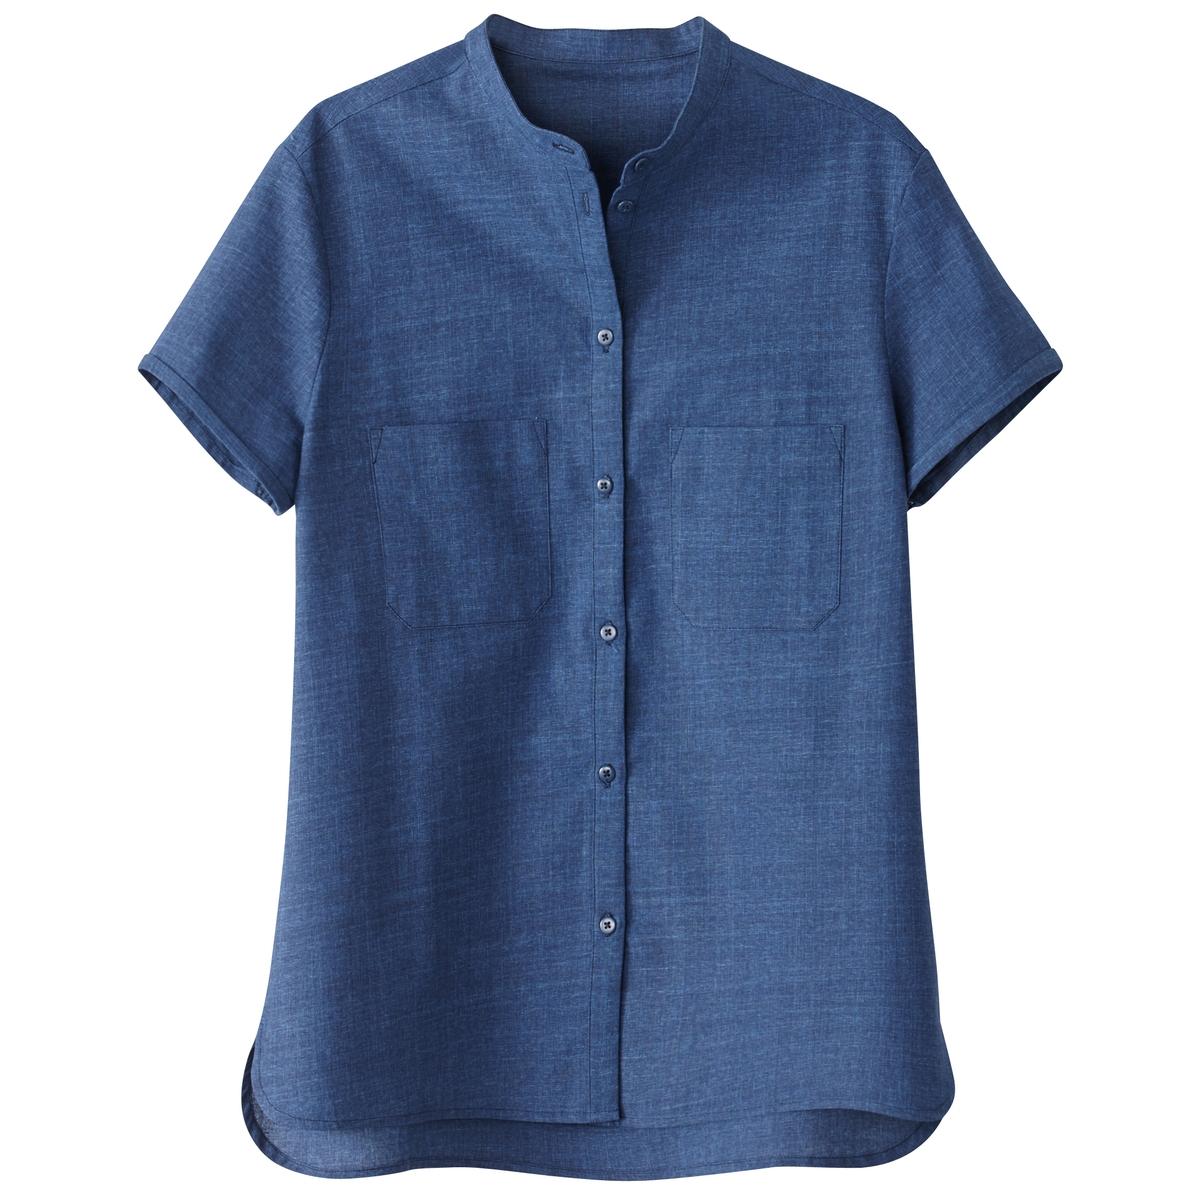 Camisa de manga corta, denim ligero